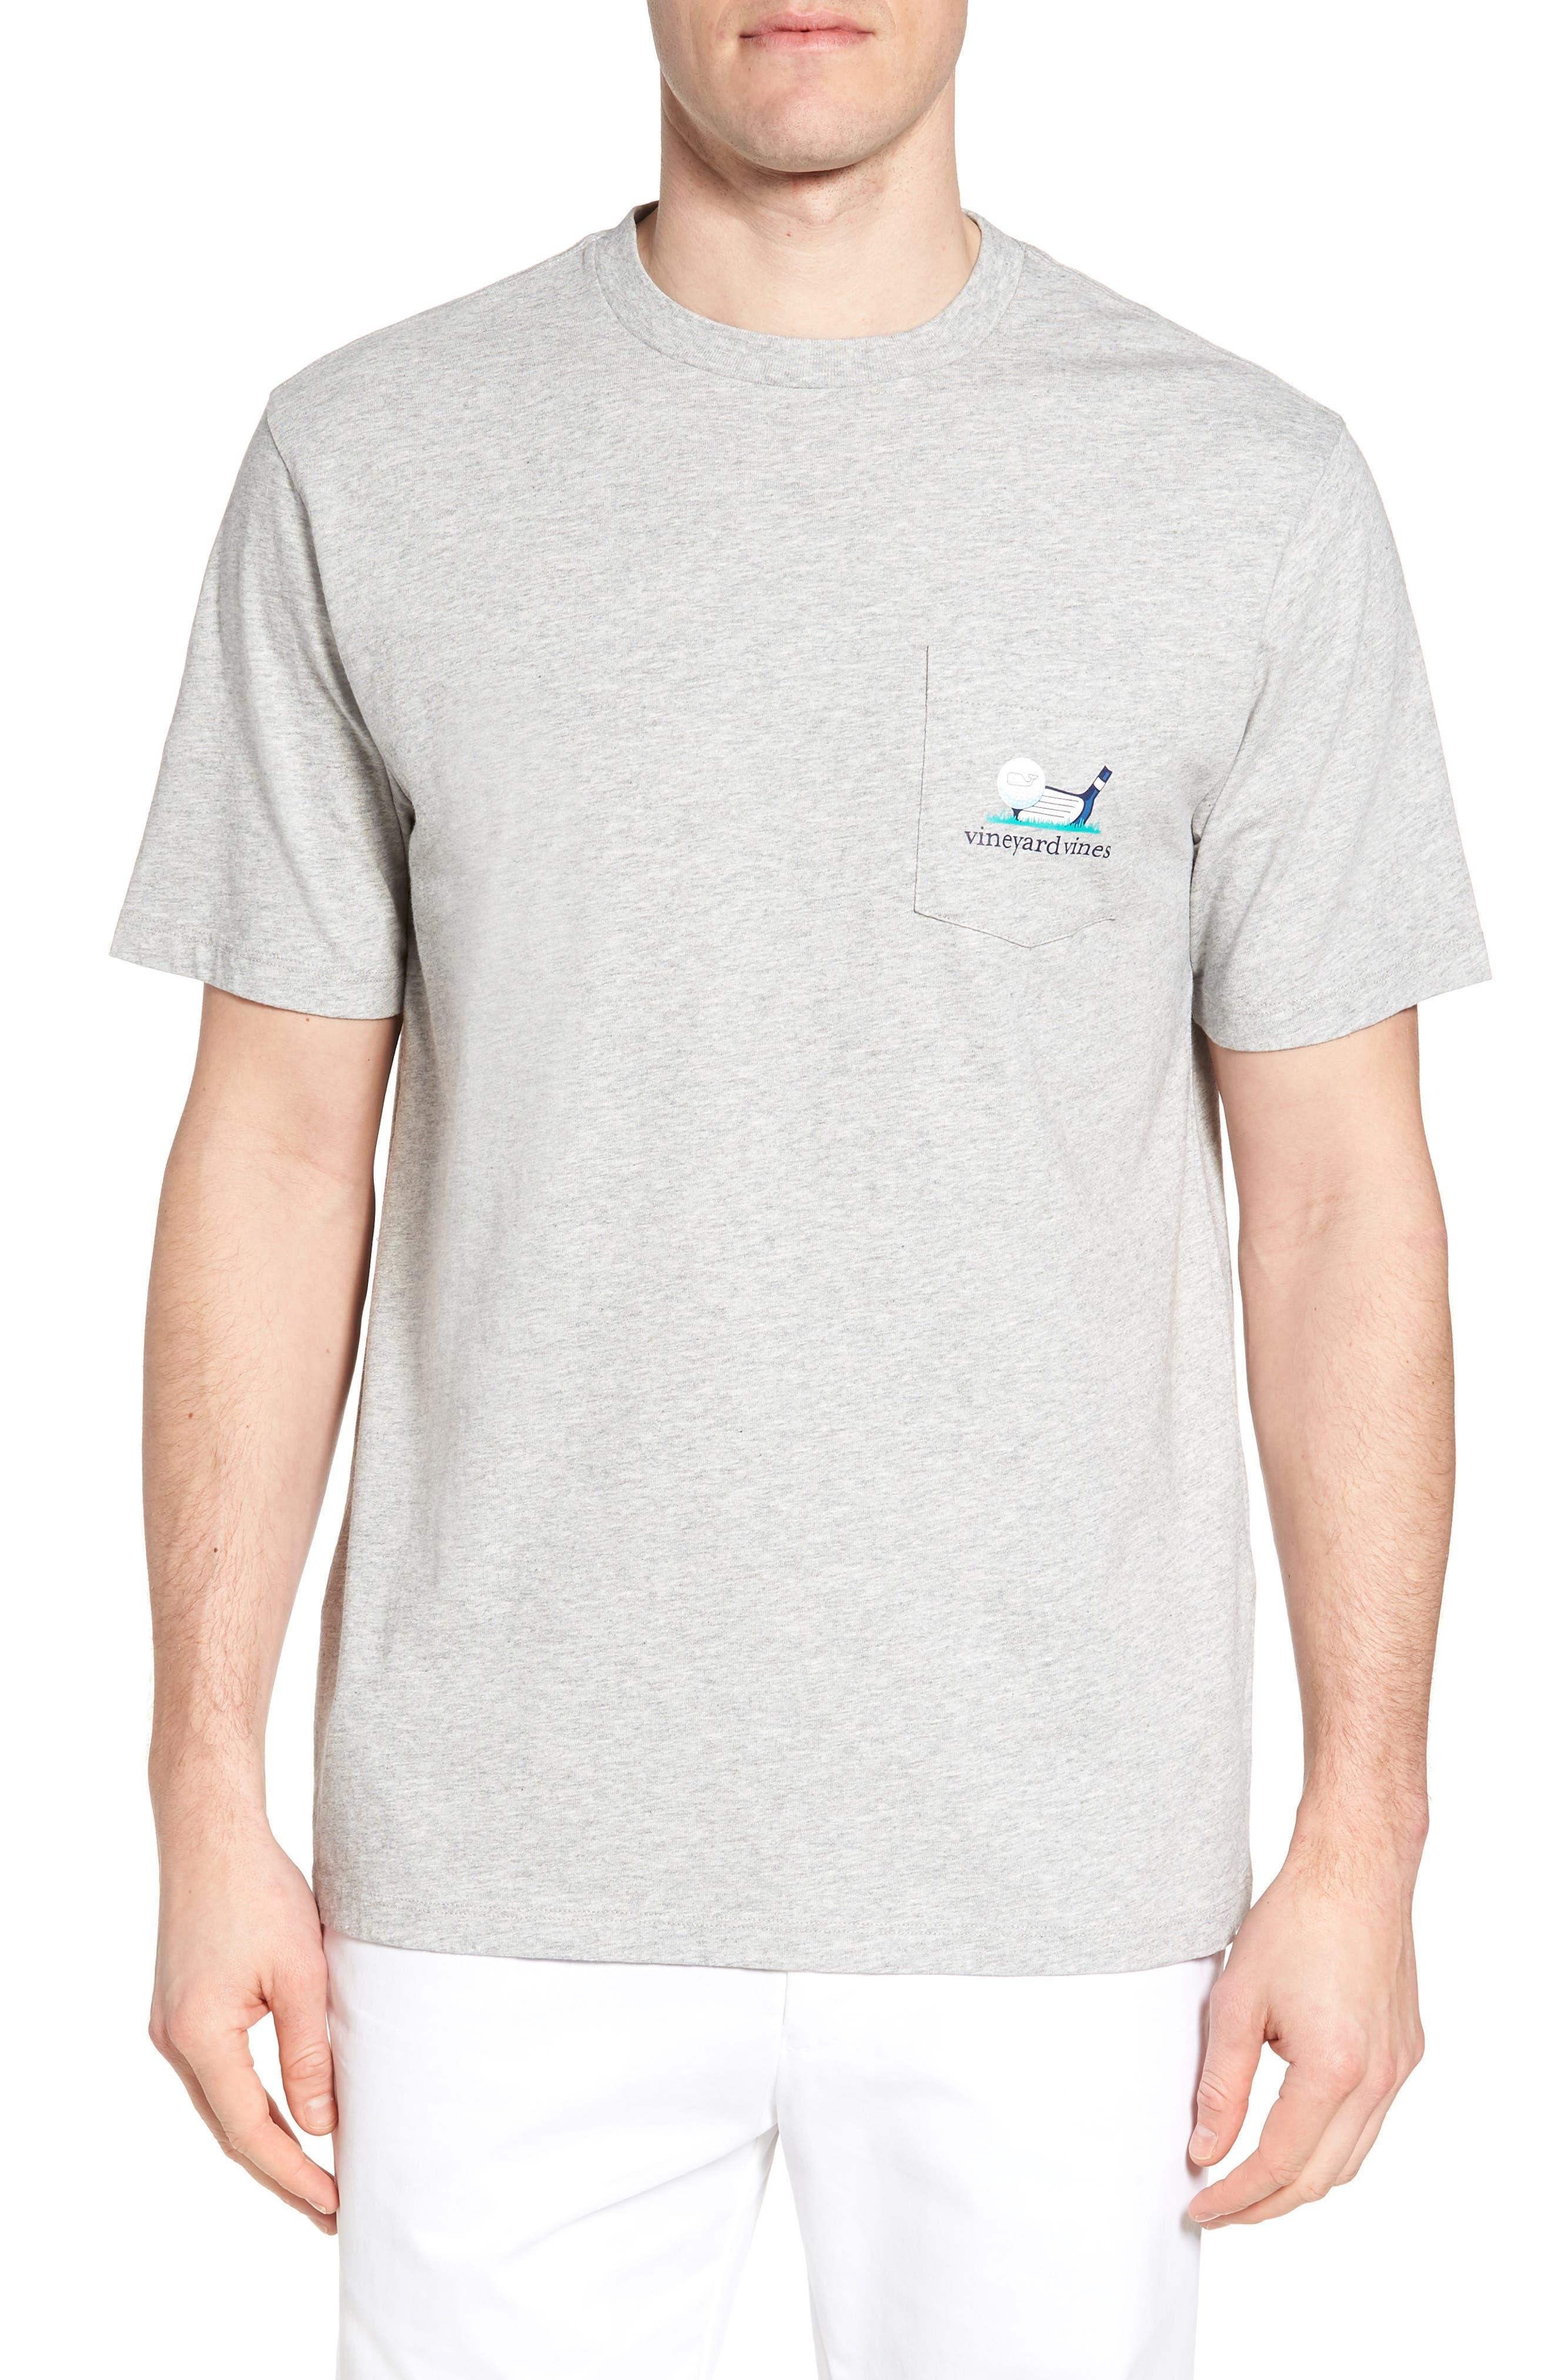 Regular Fit Golf T-Shirt,                             Main thumbnail 1, color,                             Gray Heather